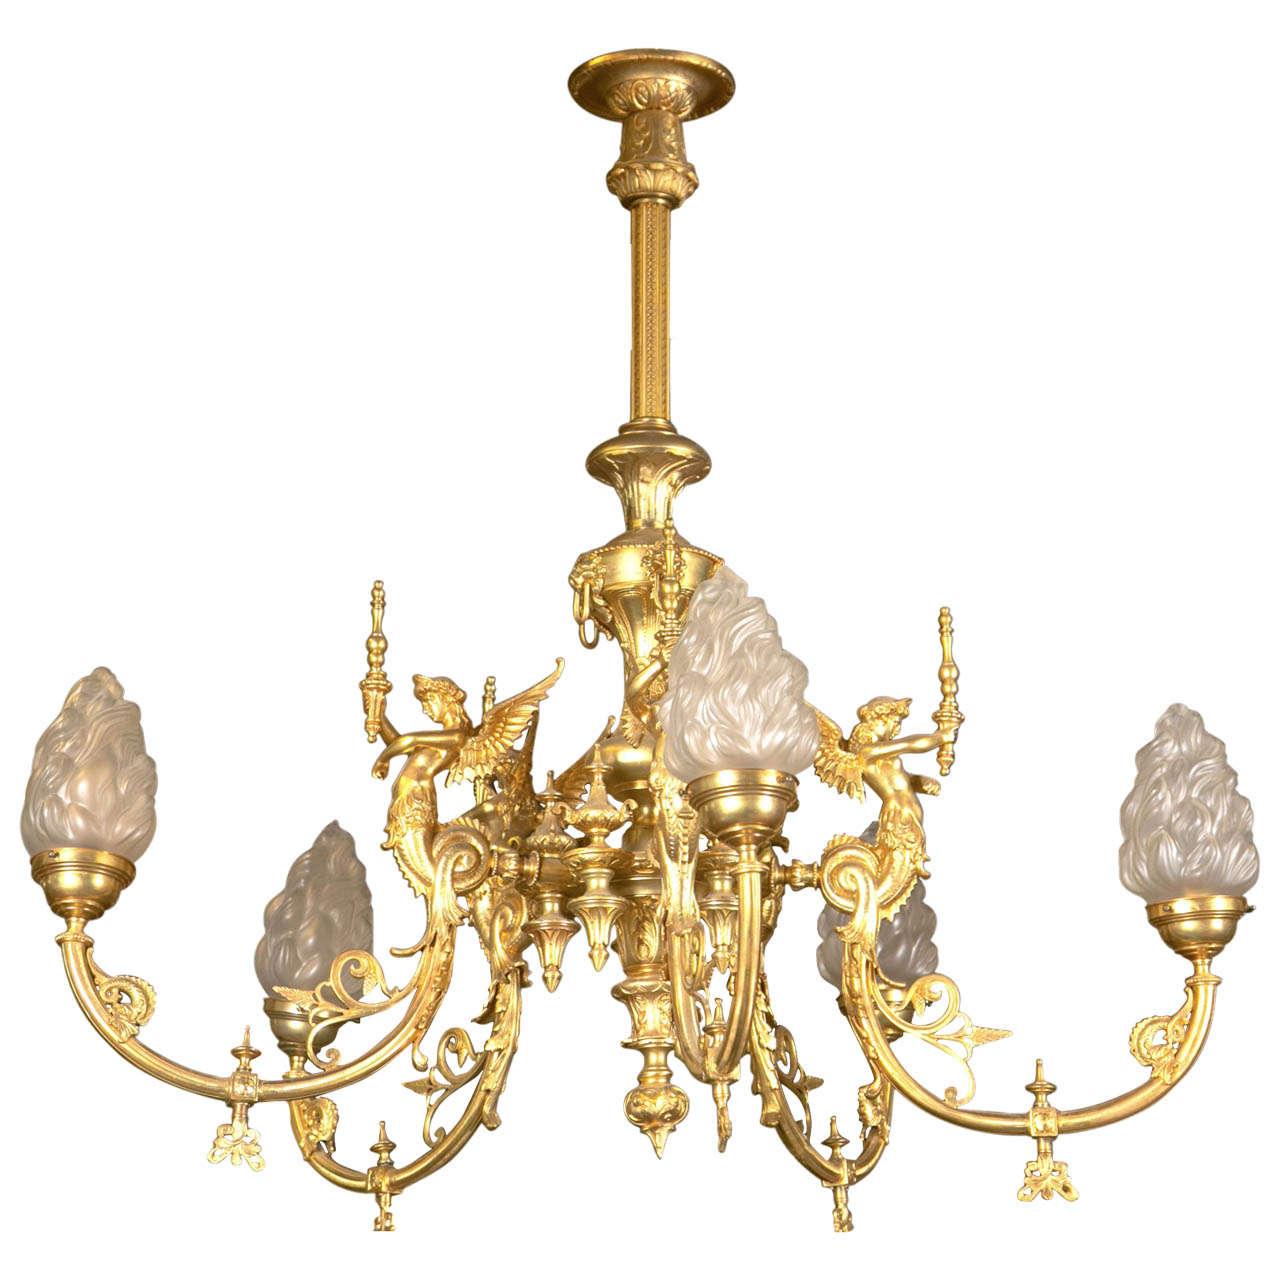 1920s antique bronze goddess chandelier for sale at 1stdibs 1920s antique bronze goddess chandelier 1 arubaitofo Gallery